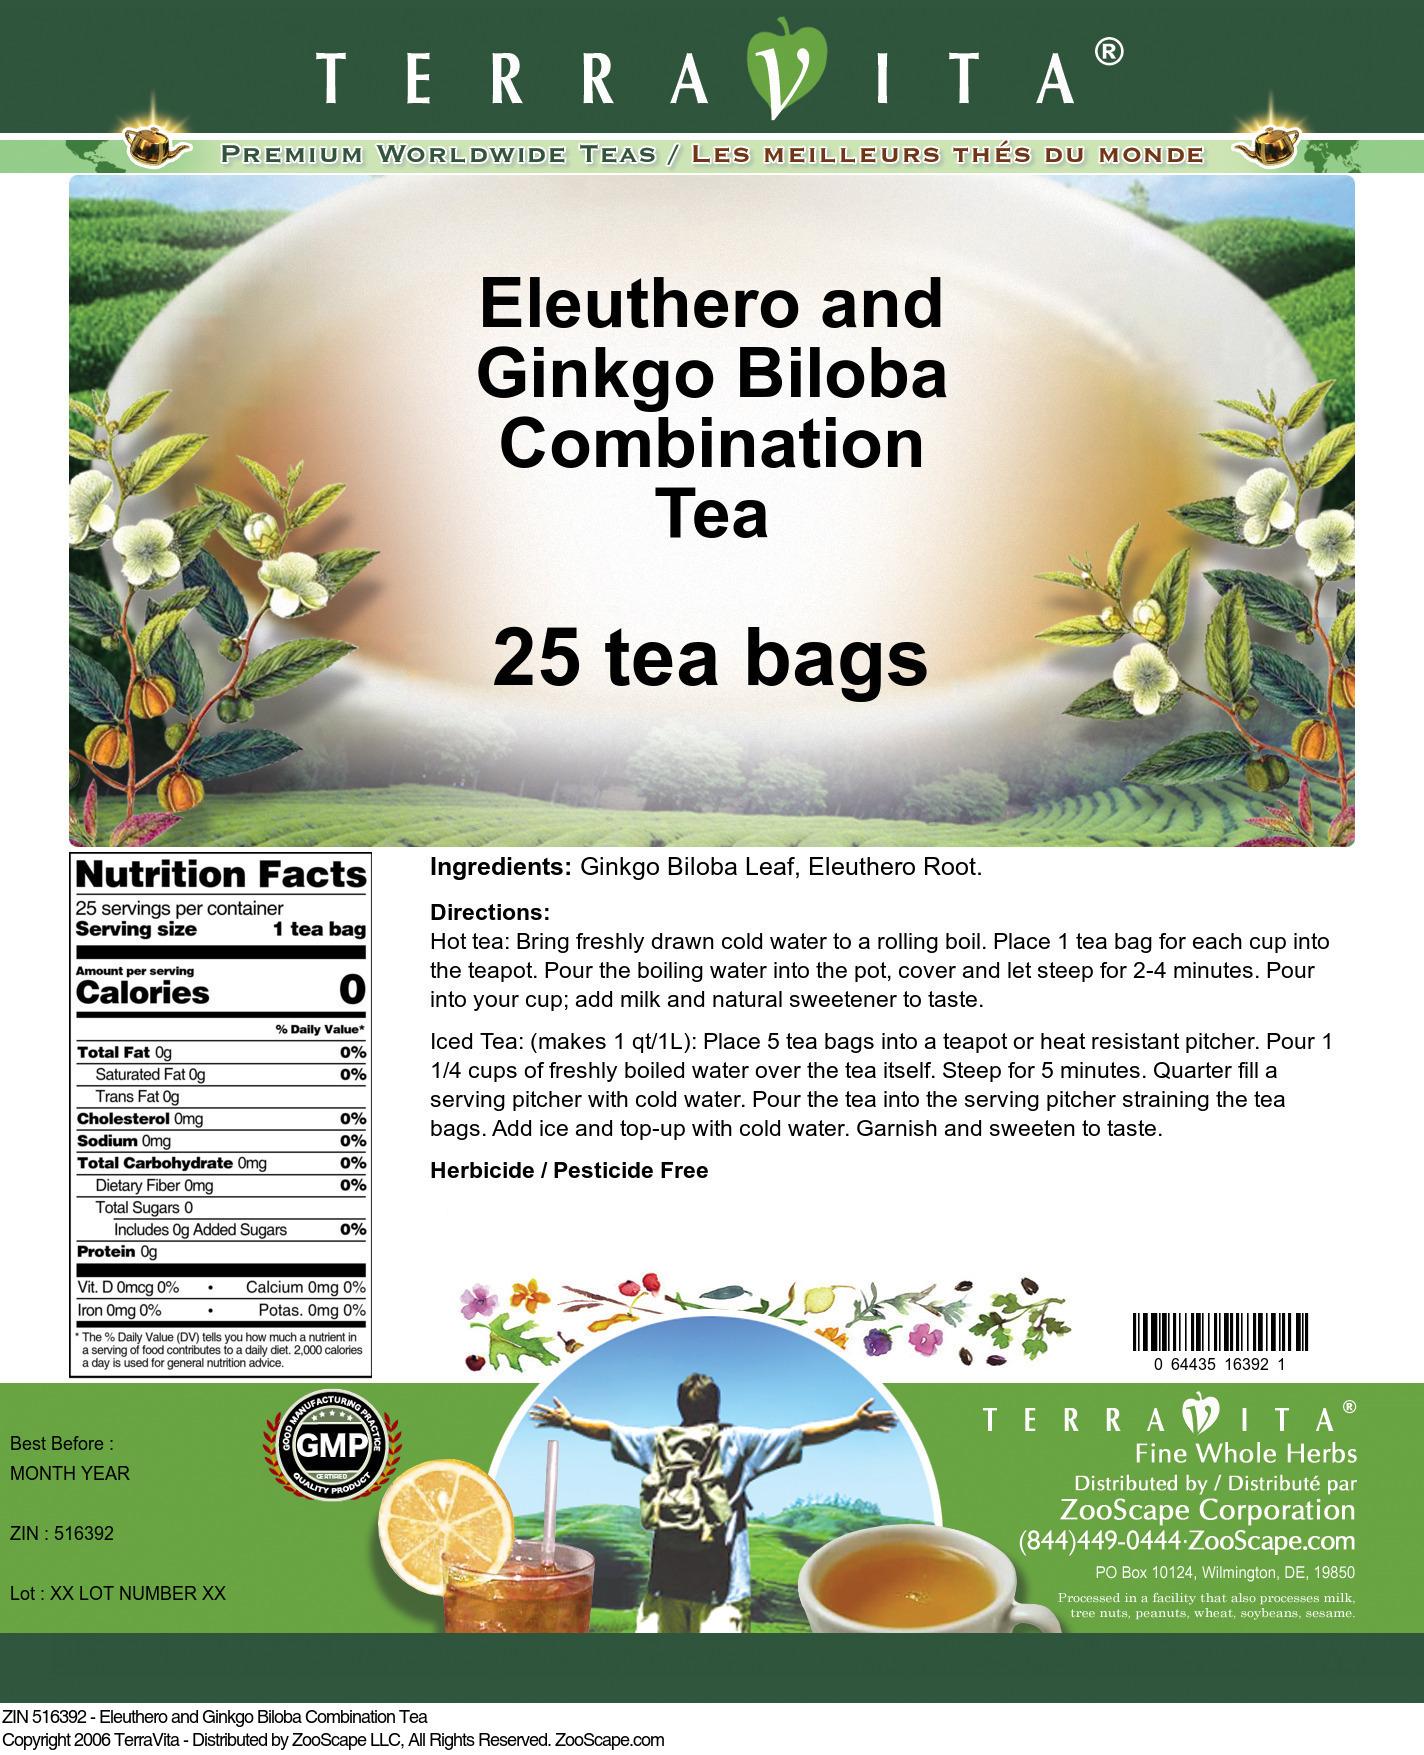 Eleuthero and Ginkgo Biloba Combination Tea